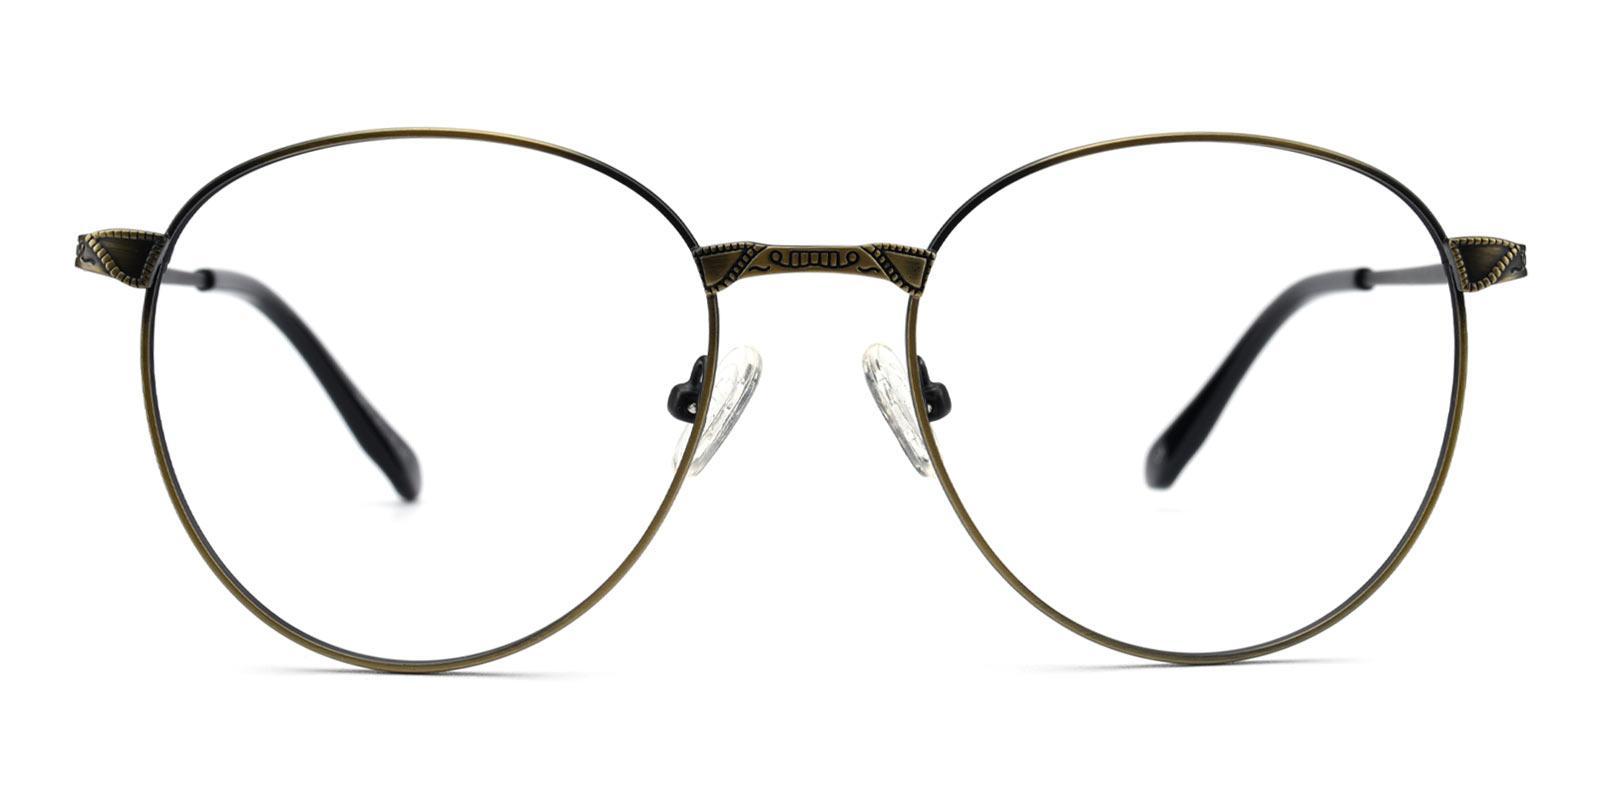 Camp-Gold-Round-Metal-Eyeglasses-additional2